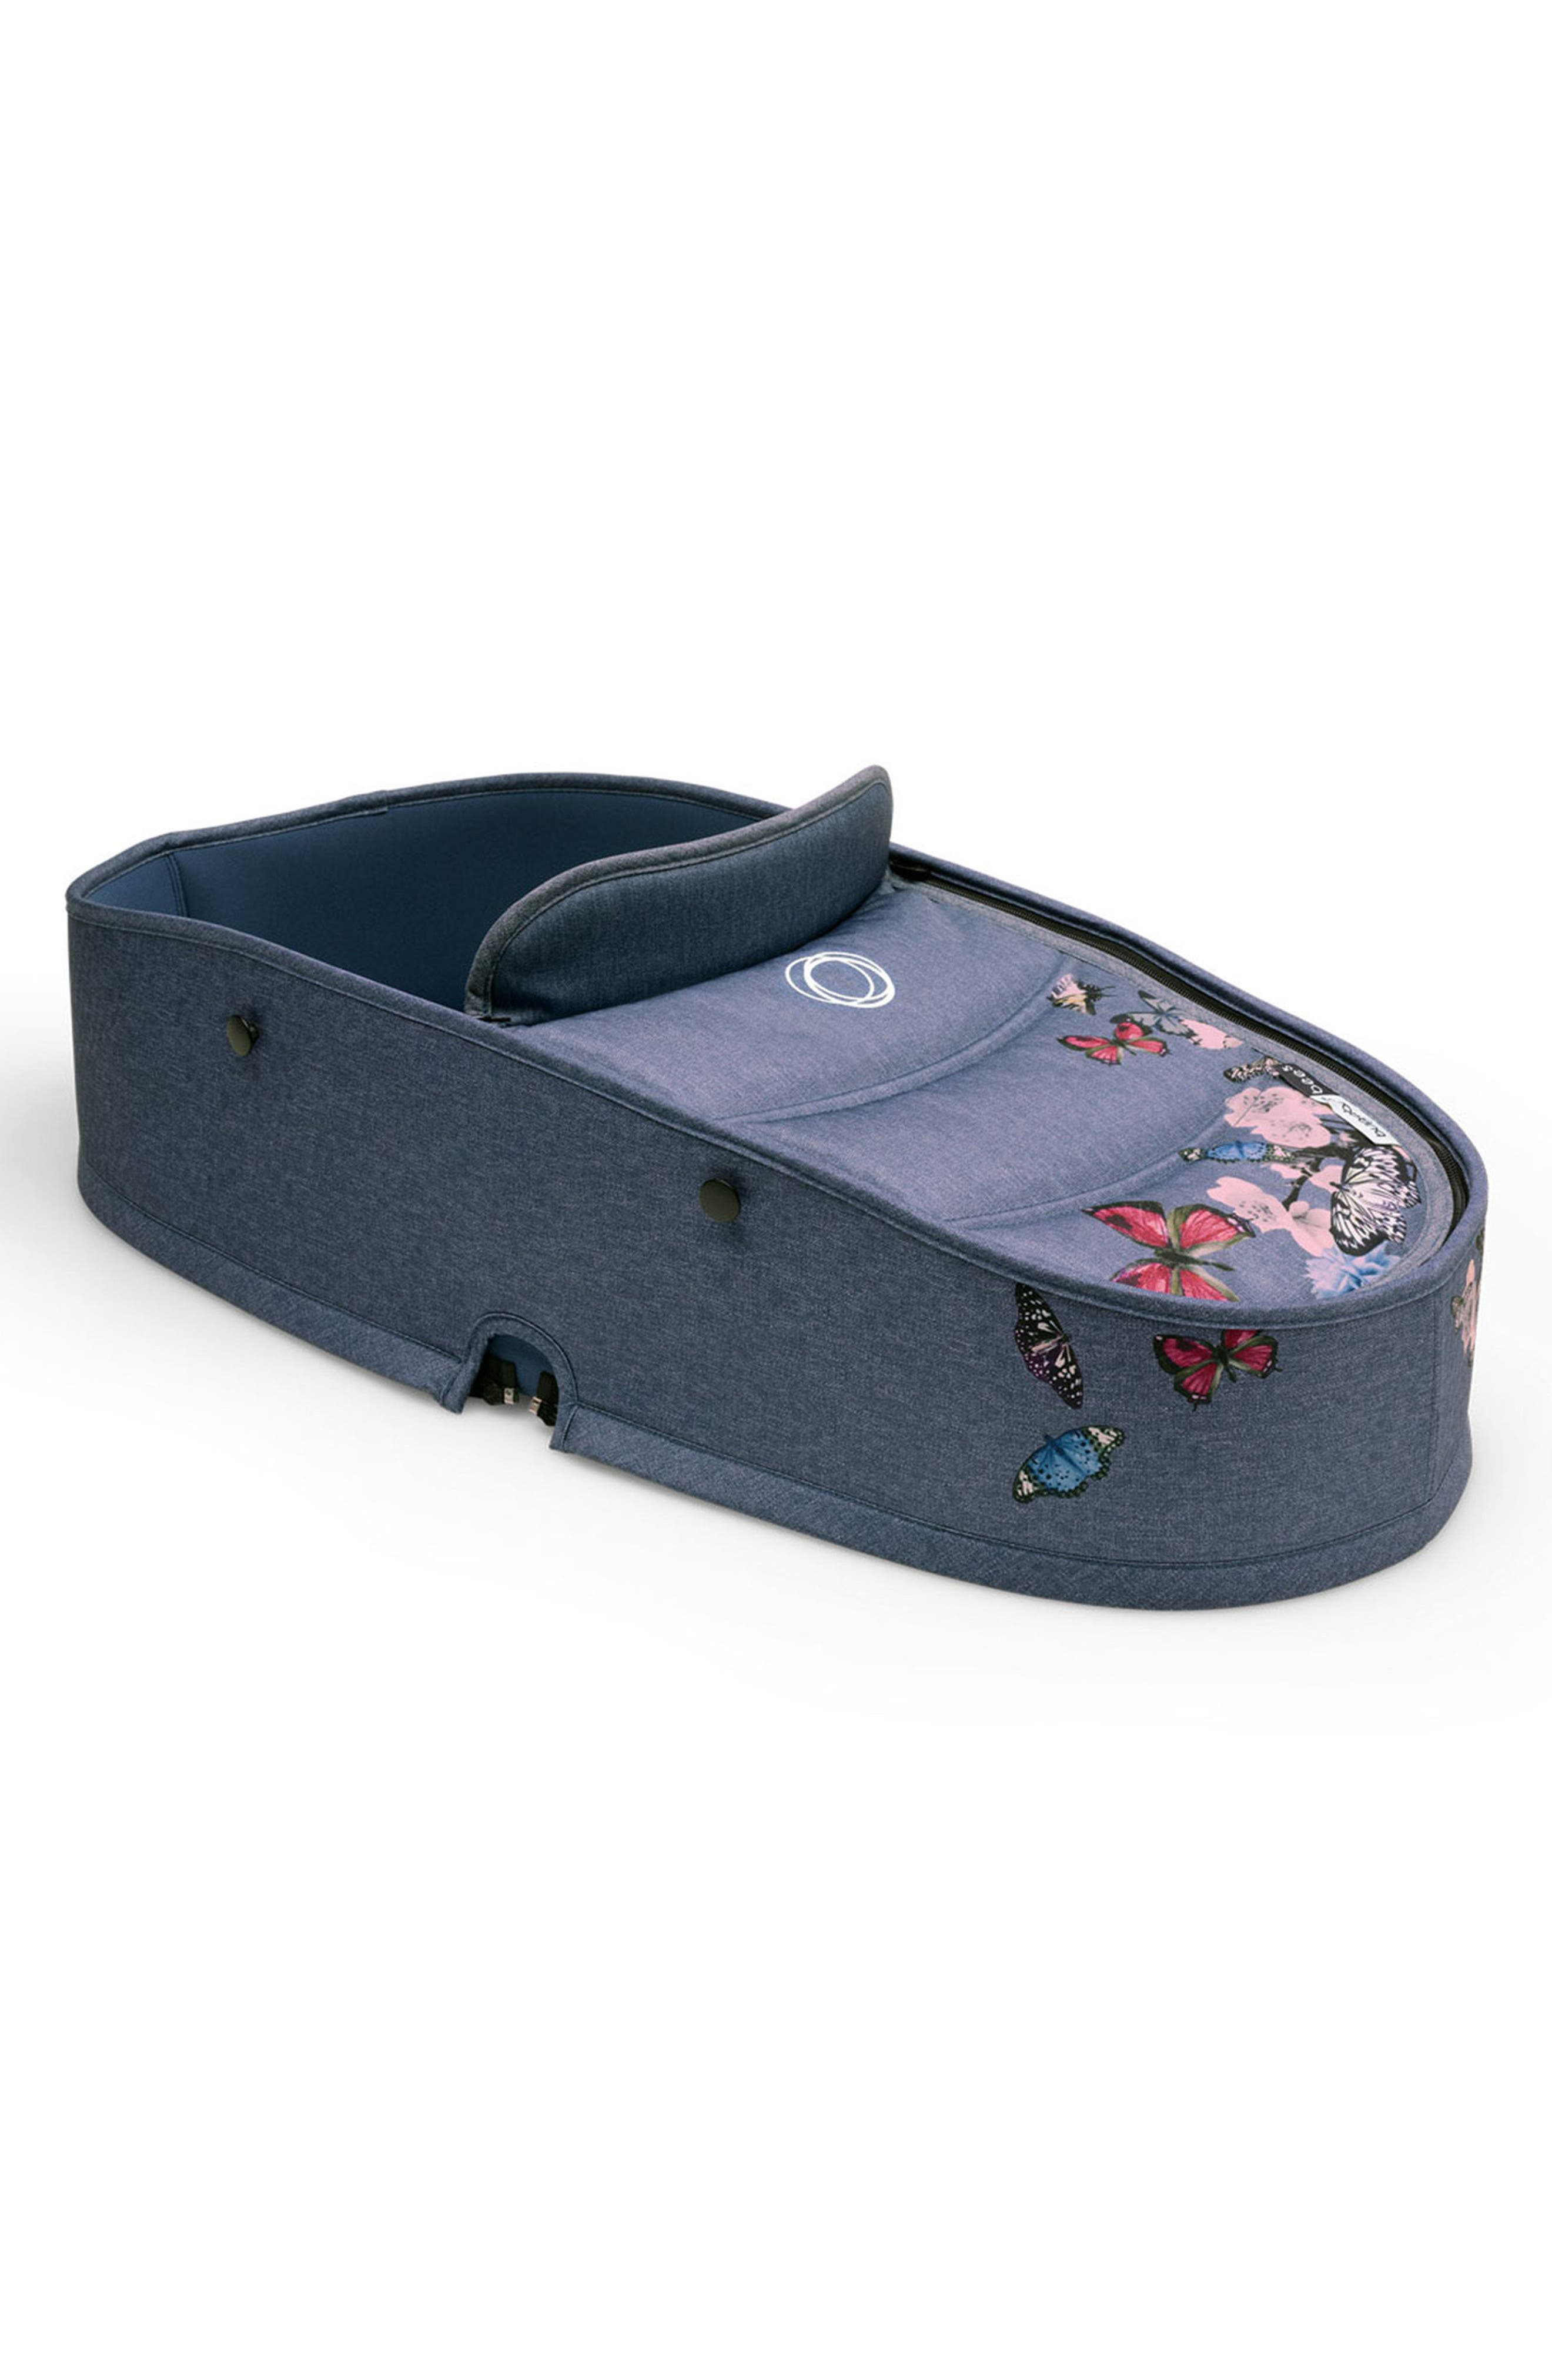 Main Image - Bugaboo Bee5 Stroller Bassinet Tailored Fabric Set